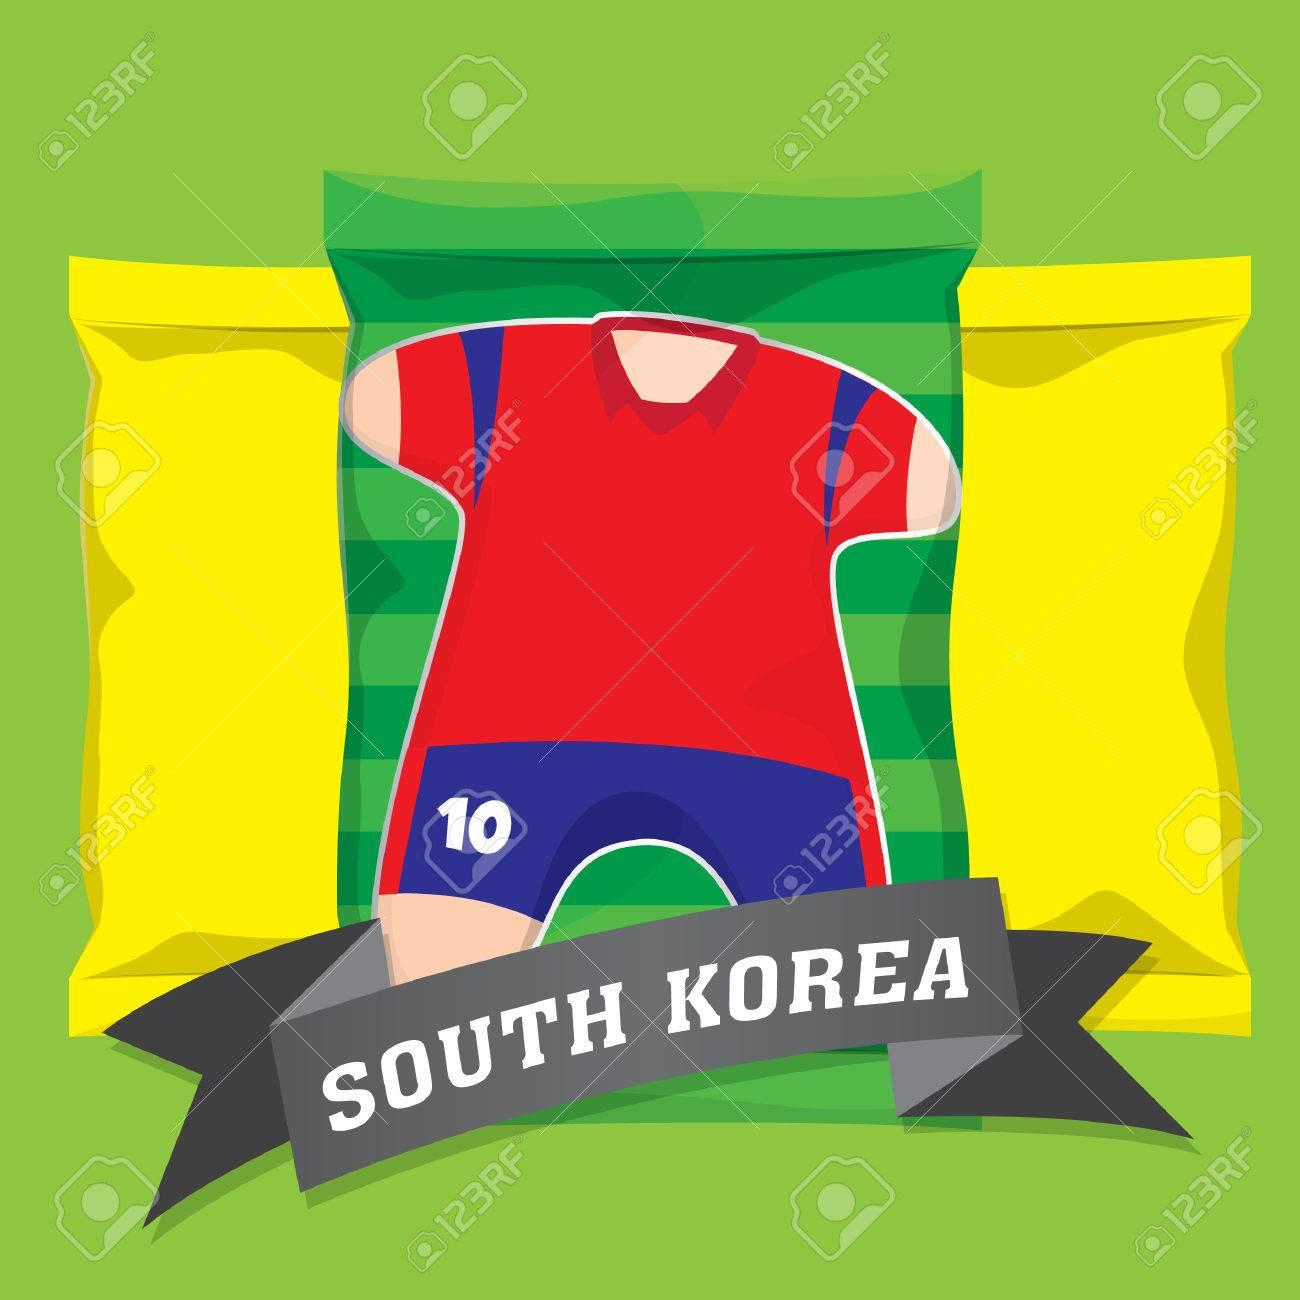 2b5a8b264 south korea soccer team uniform Stock Vector - 52731742